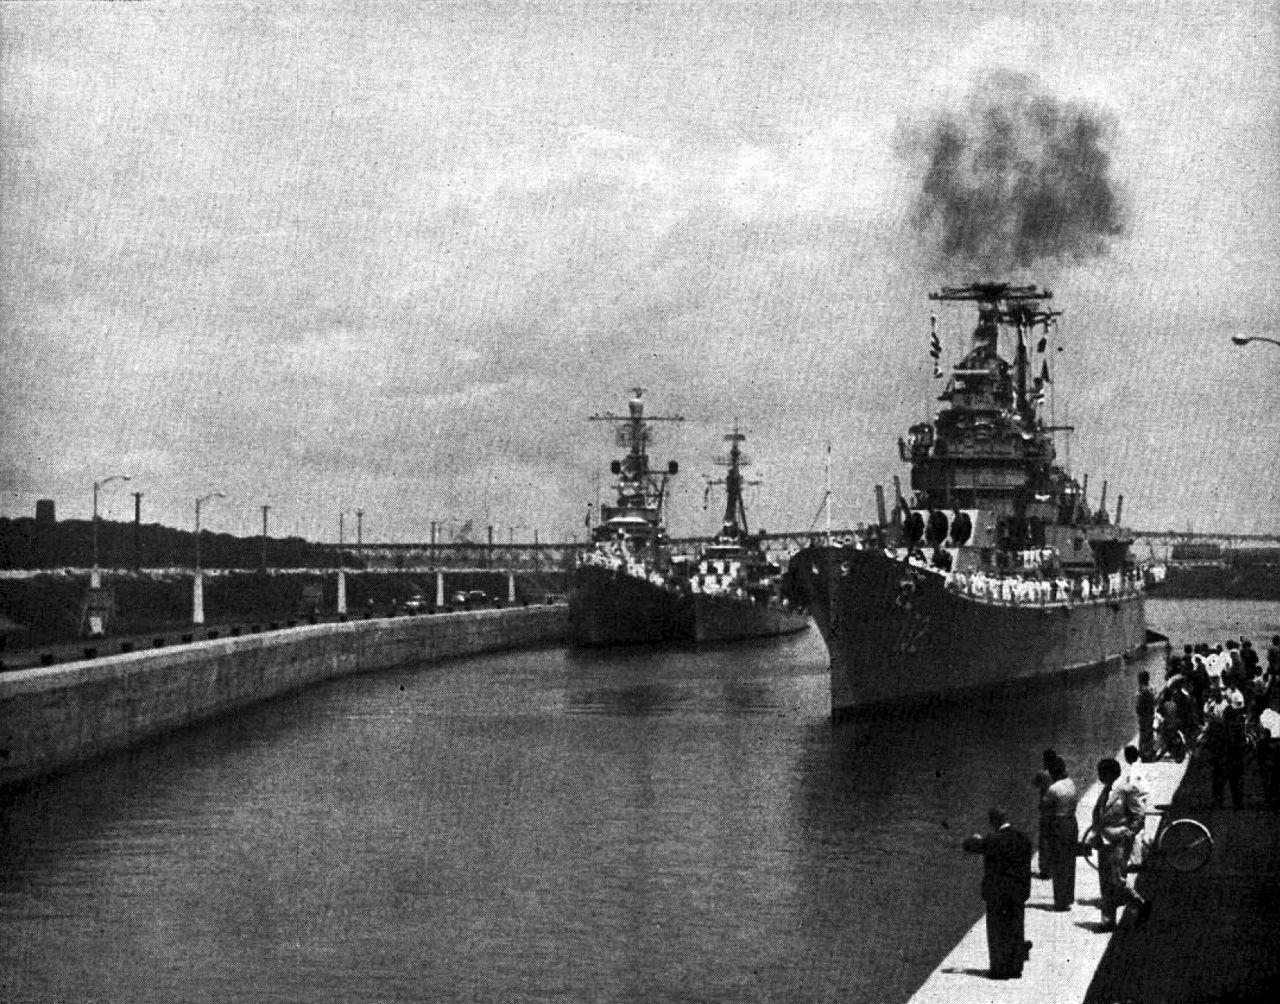 U 2 1959 File:US warship...